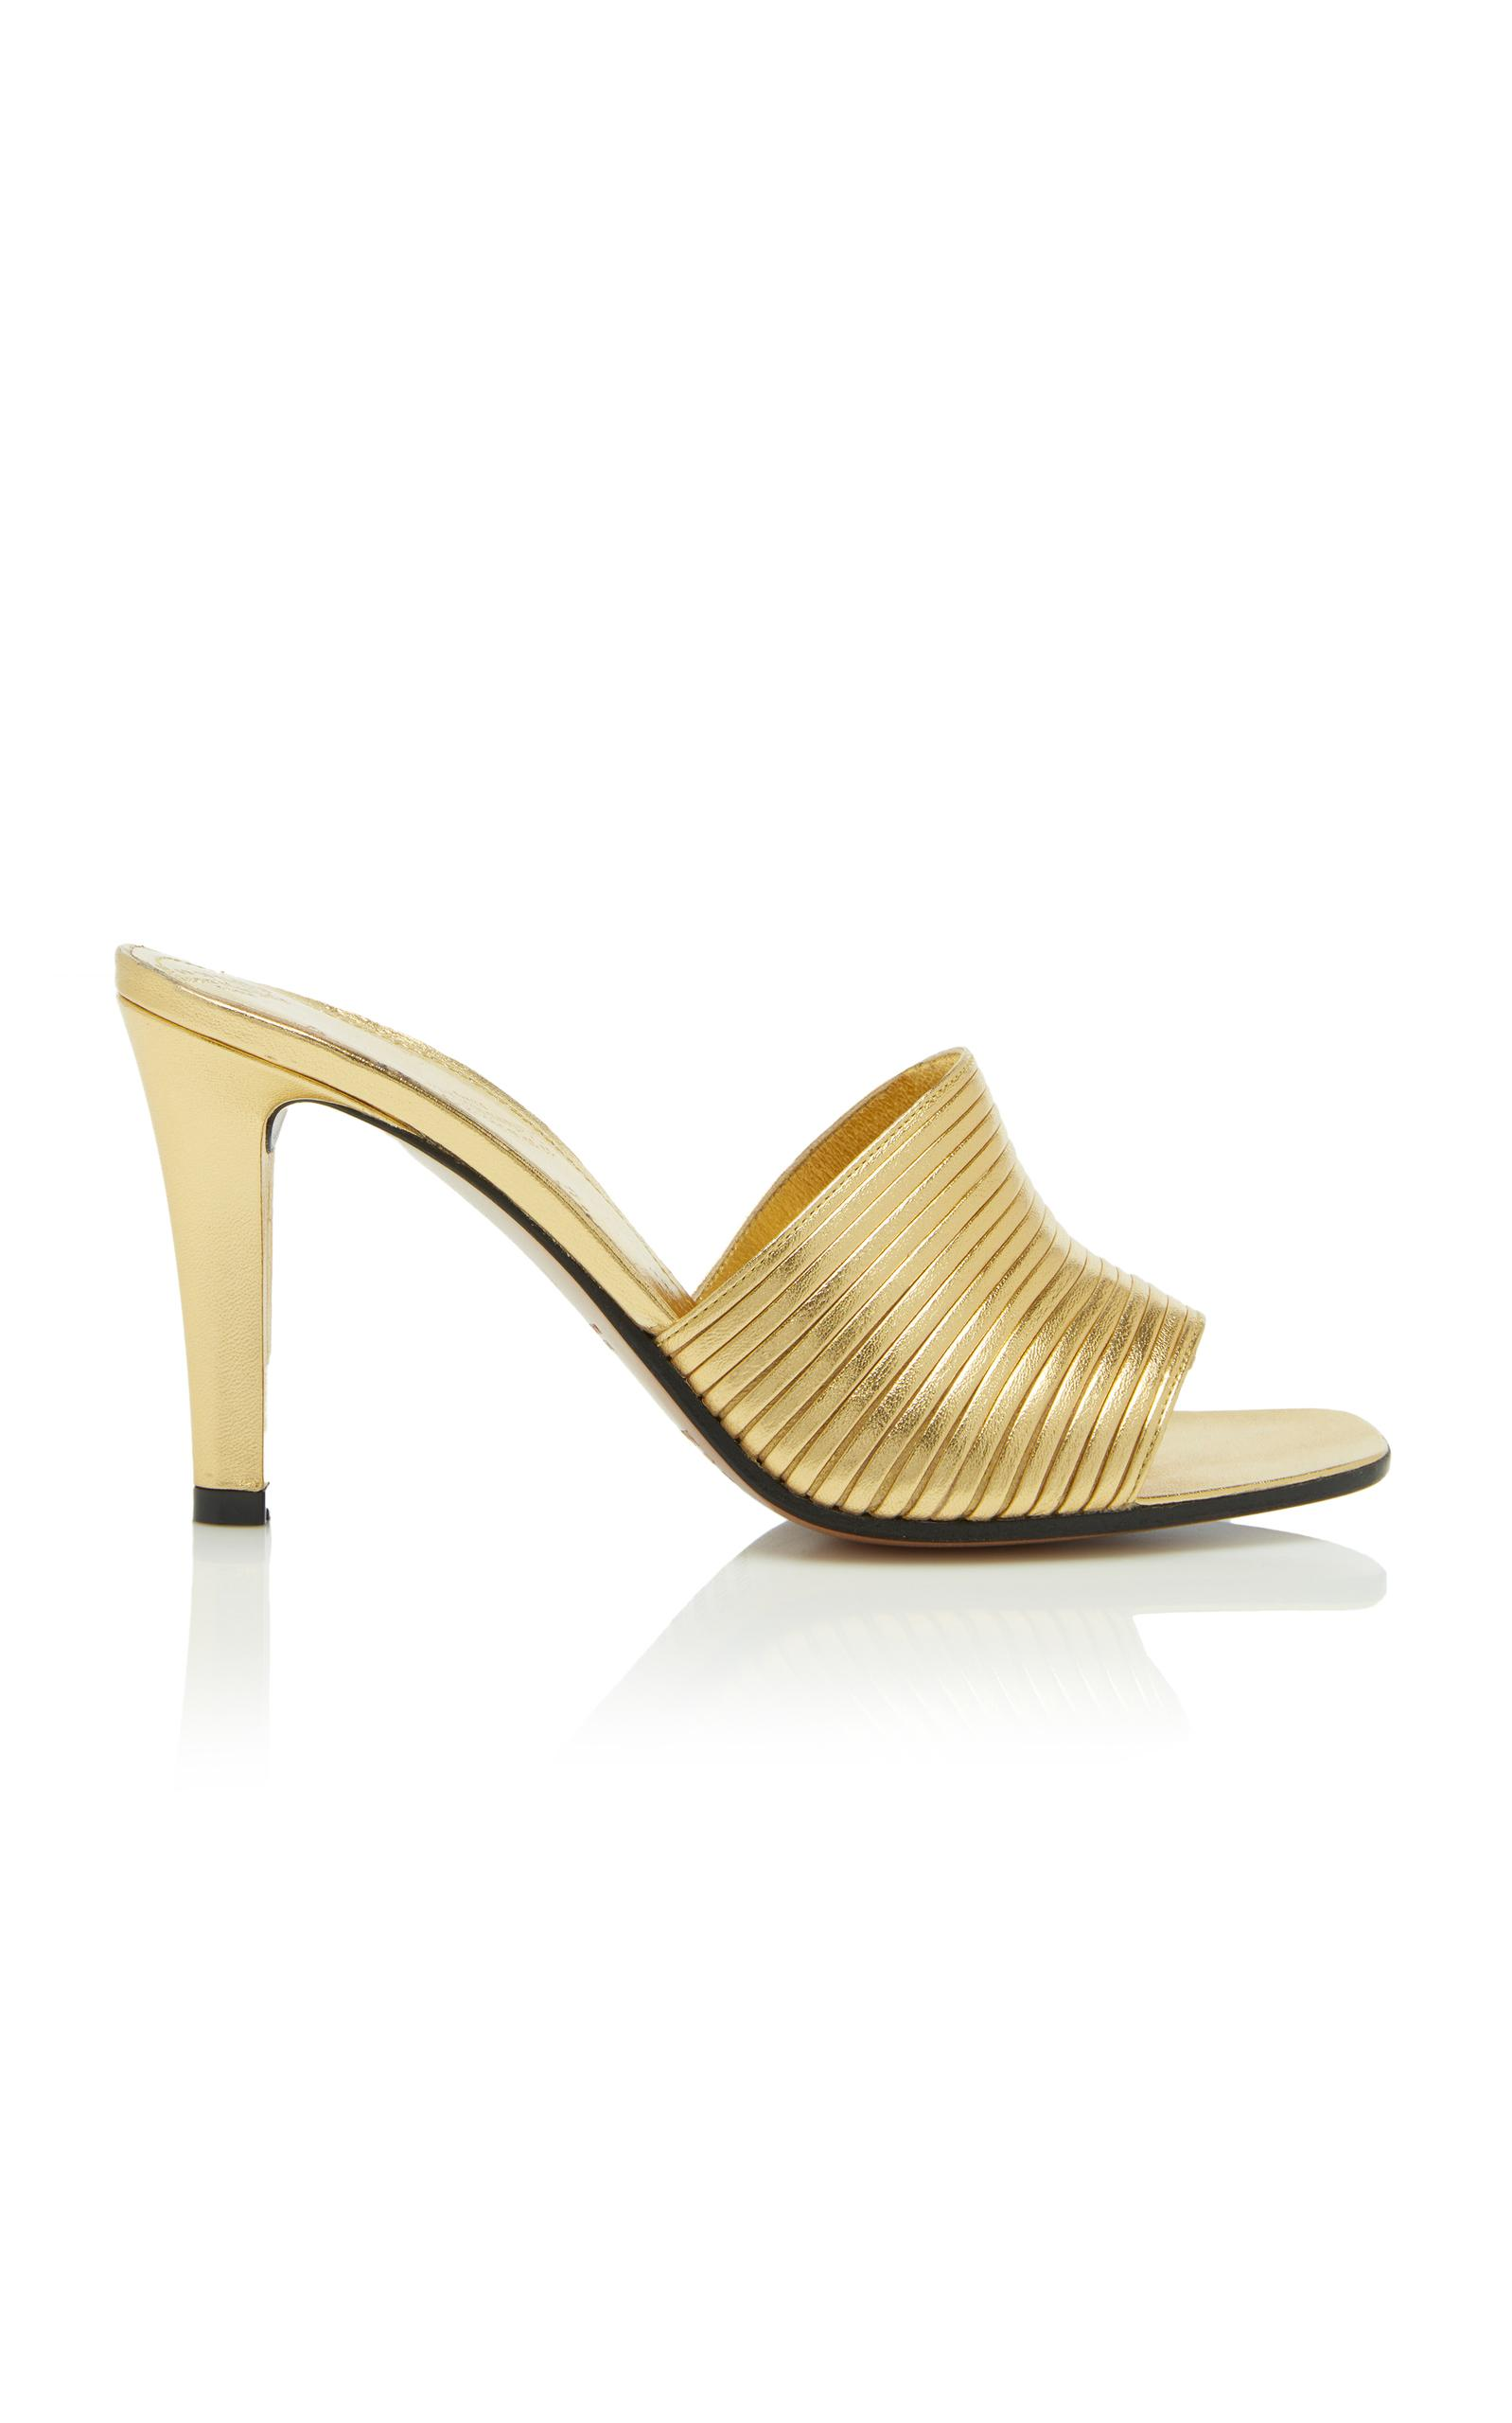 Maison Margiela Metallic Mule In Gold